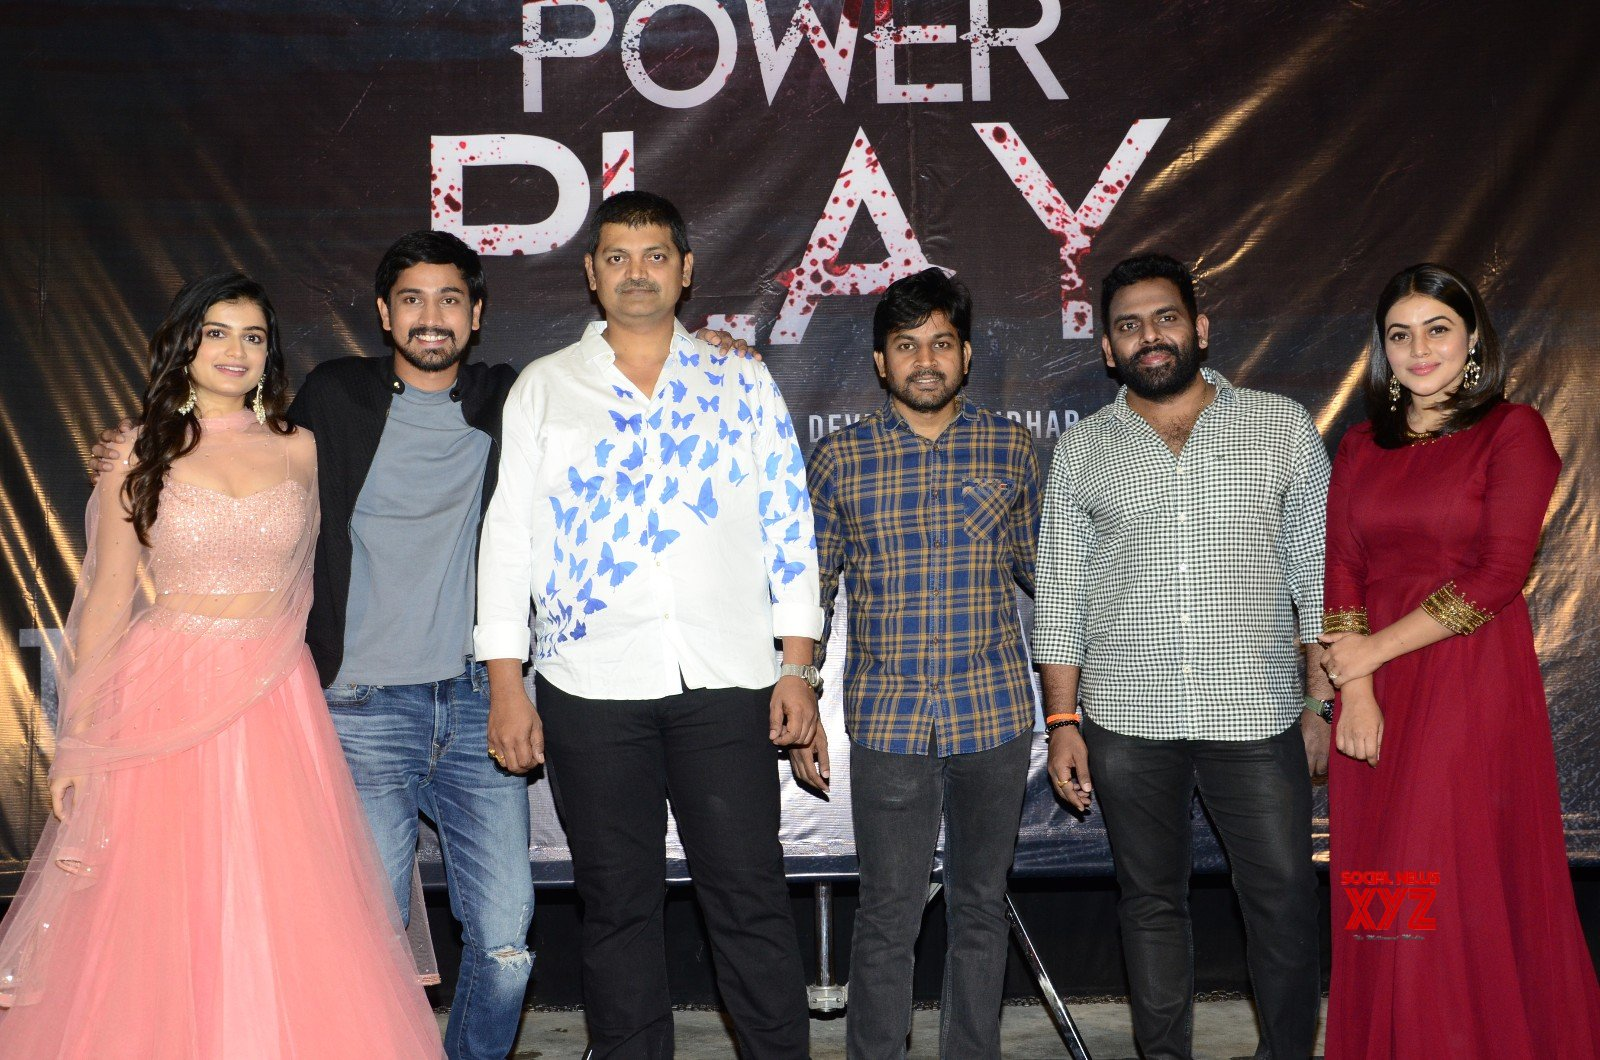 Raj Tarun - Konda Vijaykumar's 'Power Play' Worldwide Grand Release On March 5th